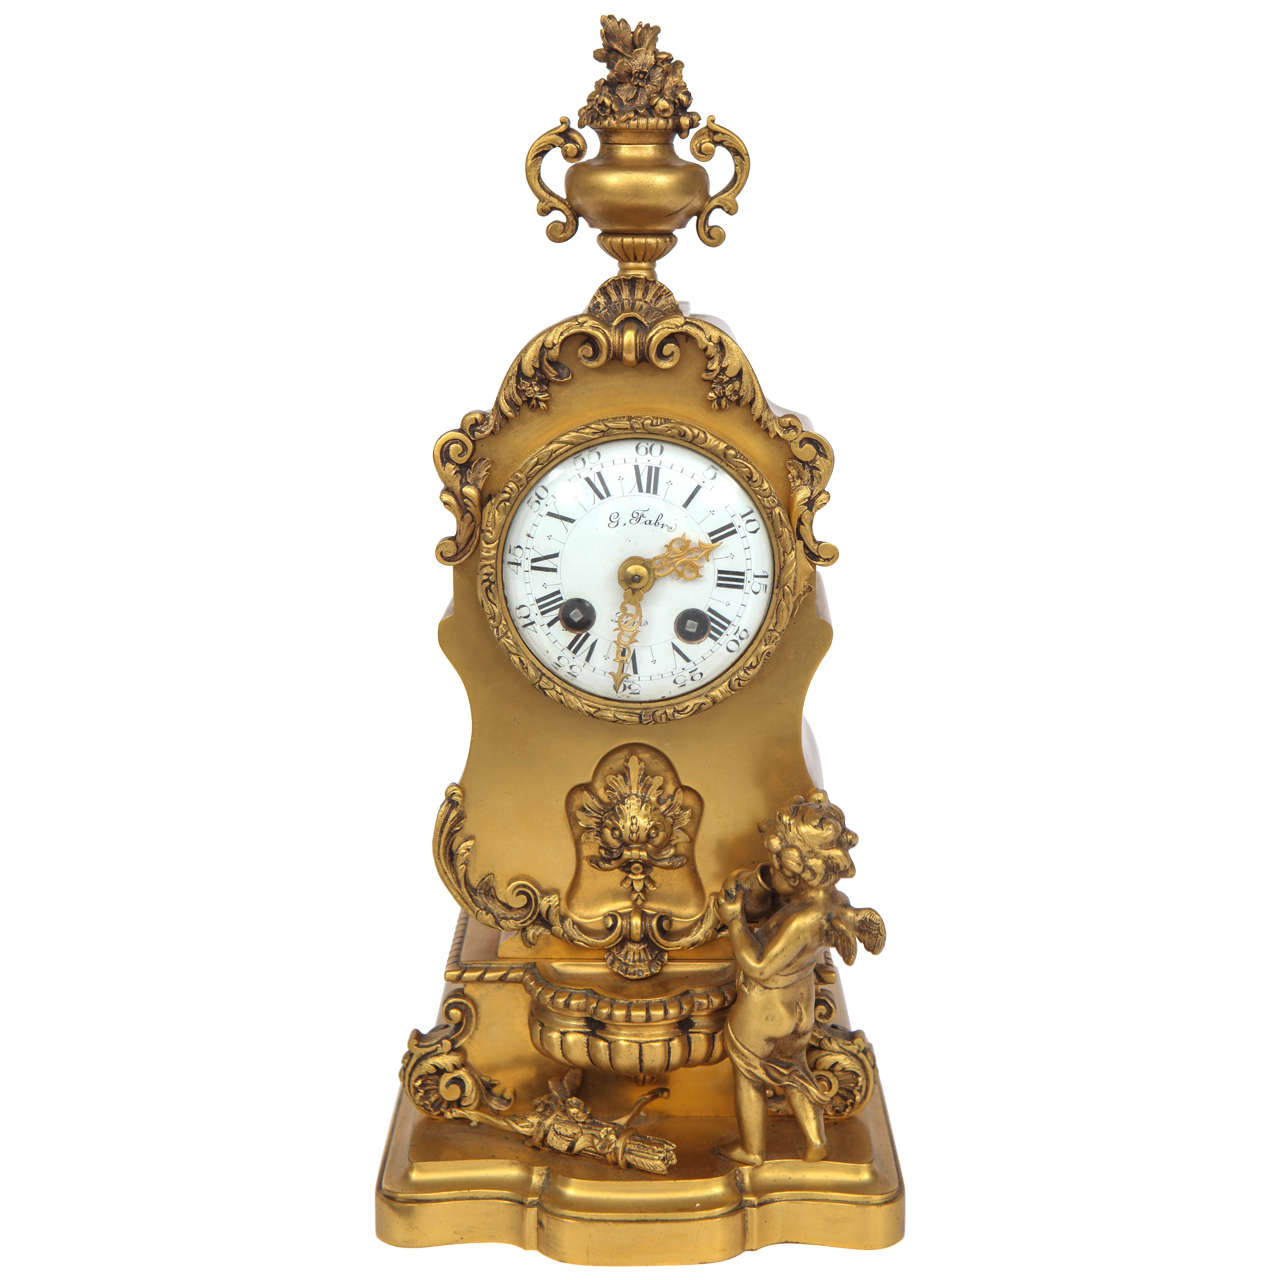 Late 19th Century French Doré Bronze Clock